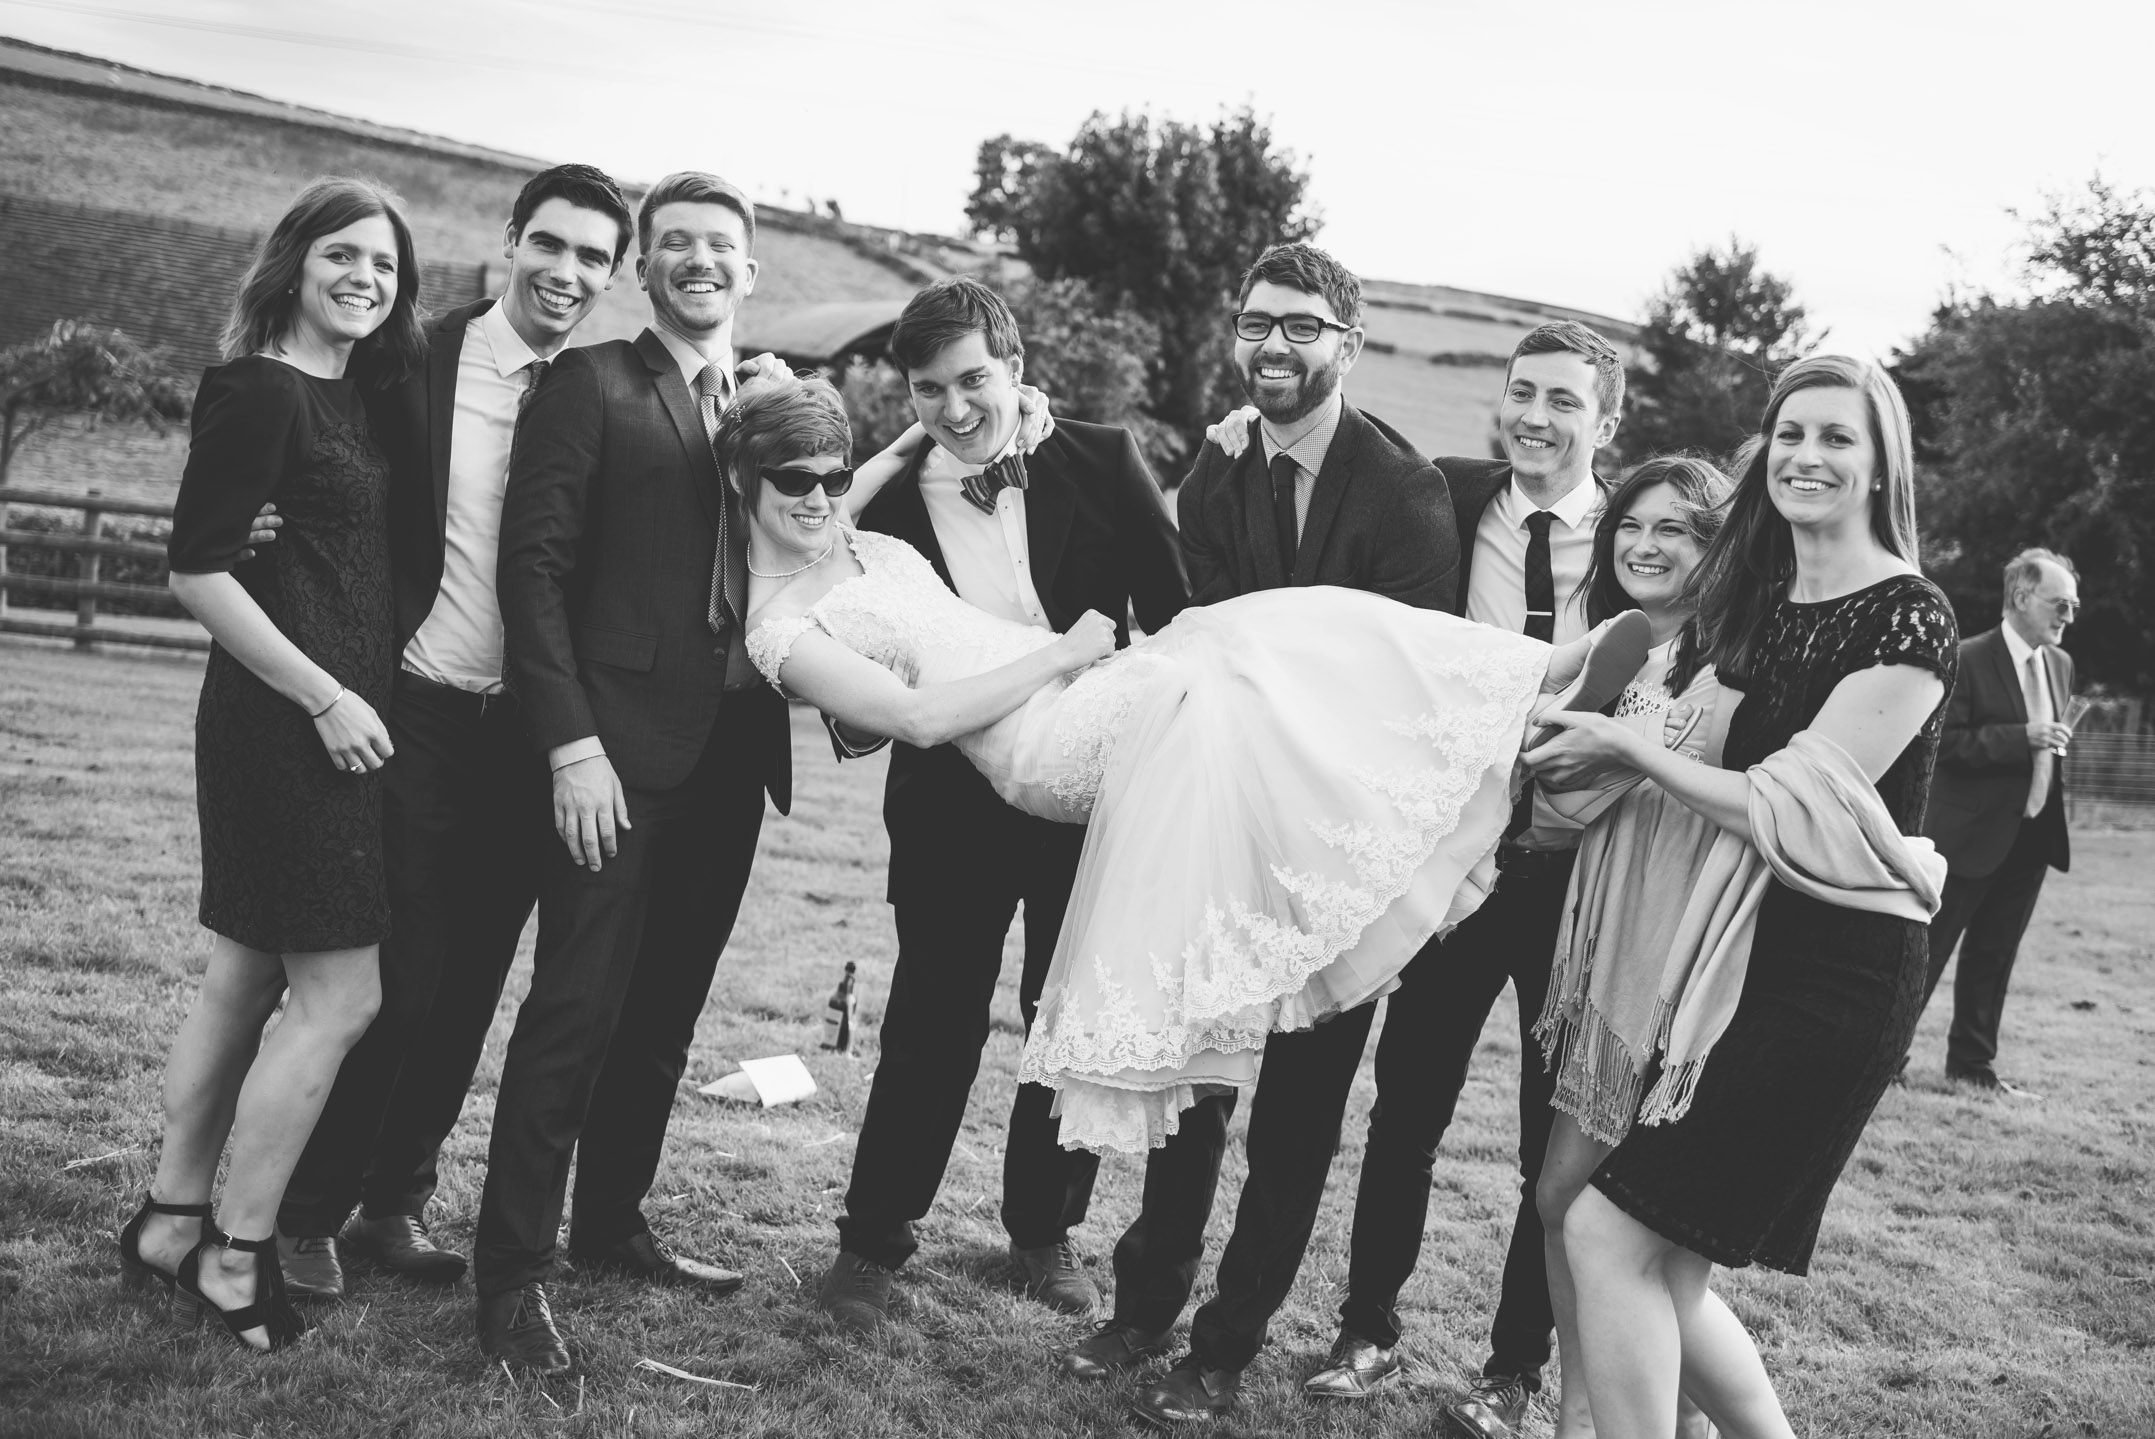 Peak+district+farm+wedding+lower+damgate+photographer-174.jpg